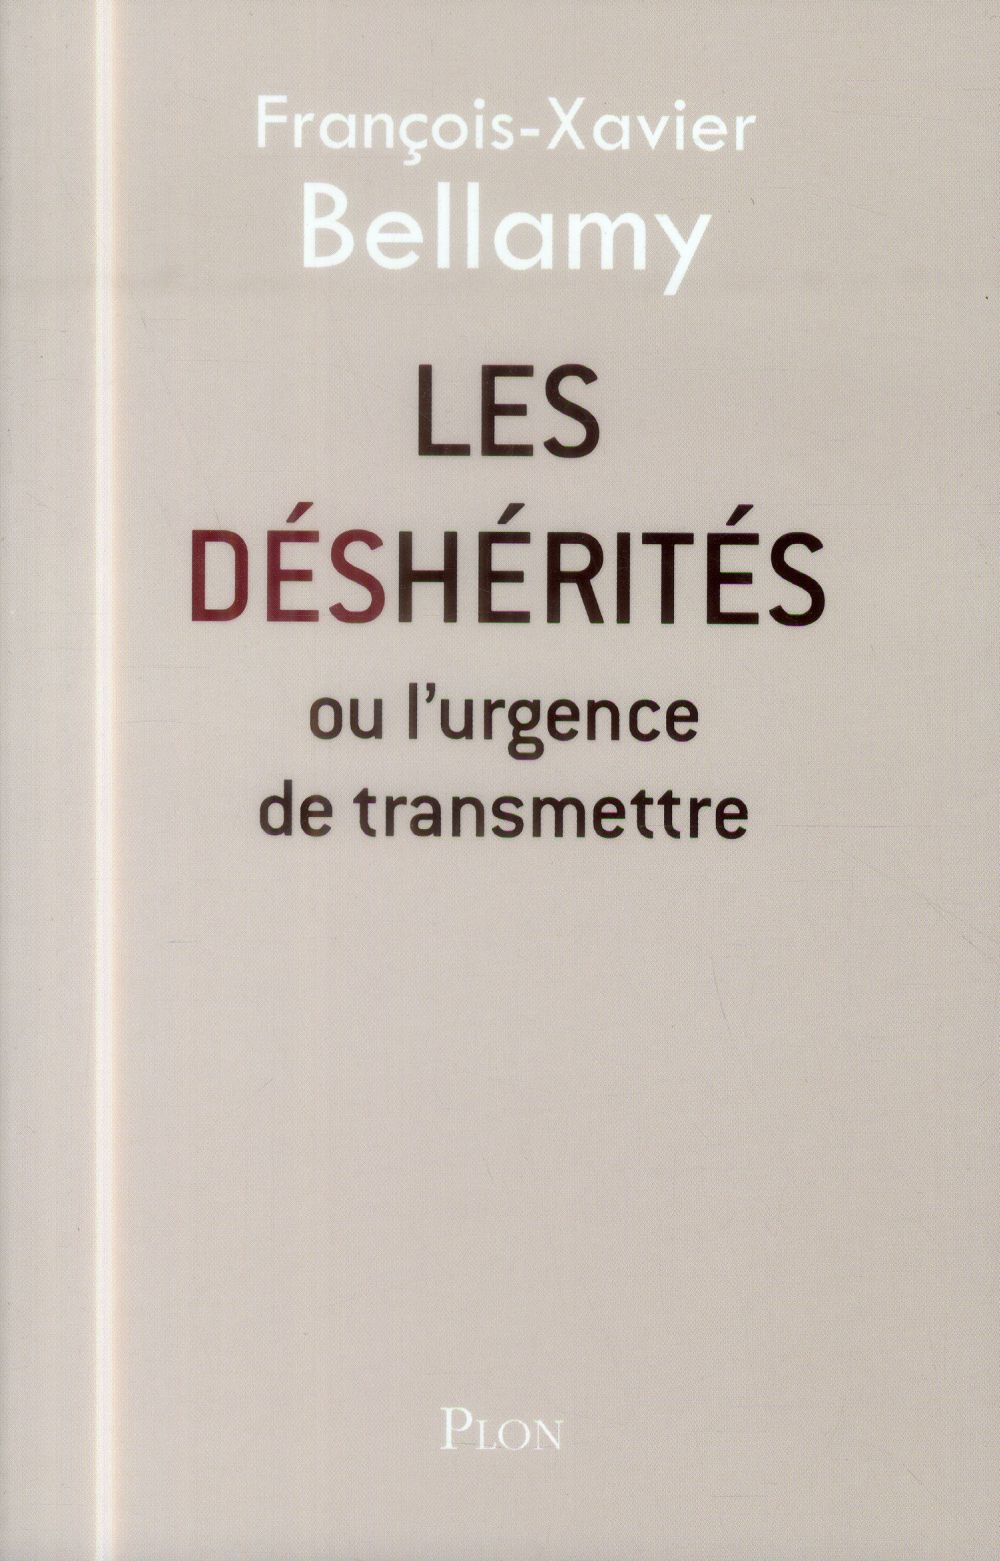 LES DESHERITES OU L'URGENCE DE TRANSMETTRE